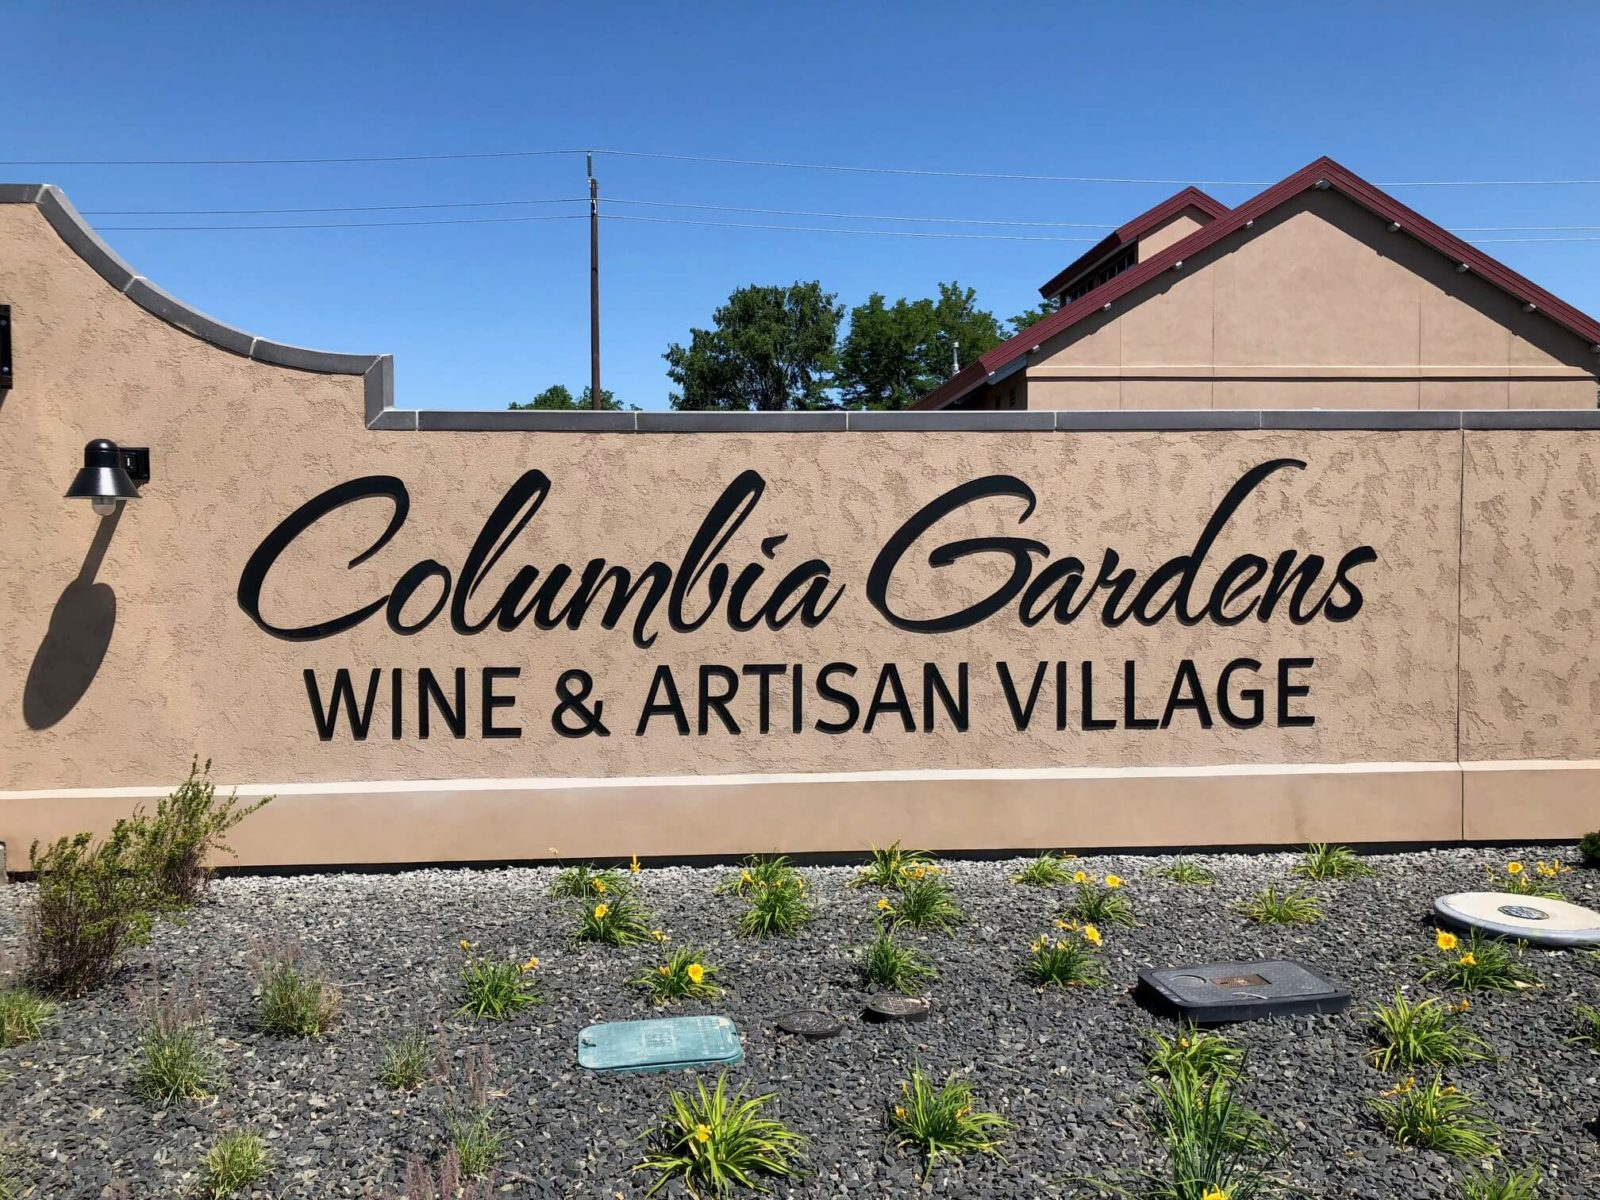 Columbia Gardens Wine & Artisan Village signage.